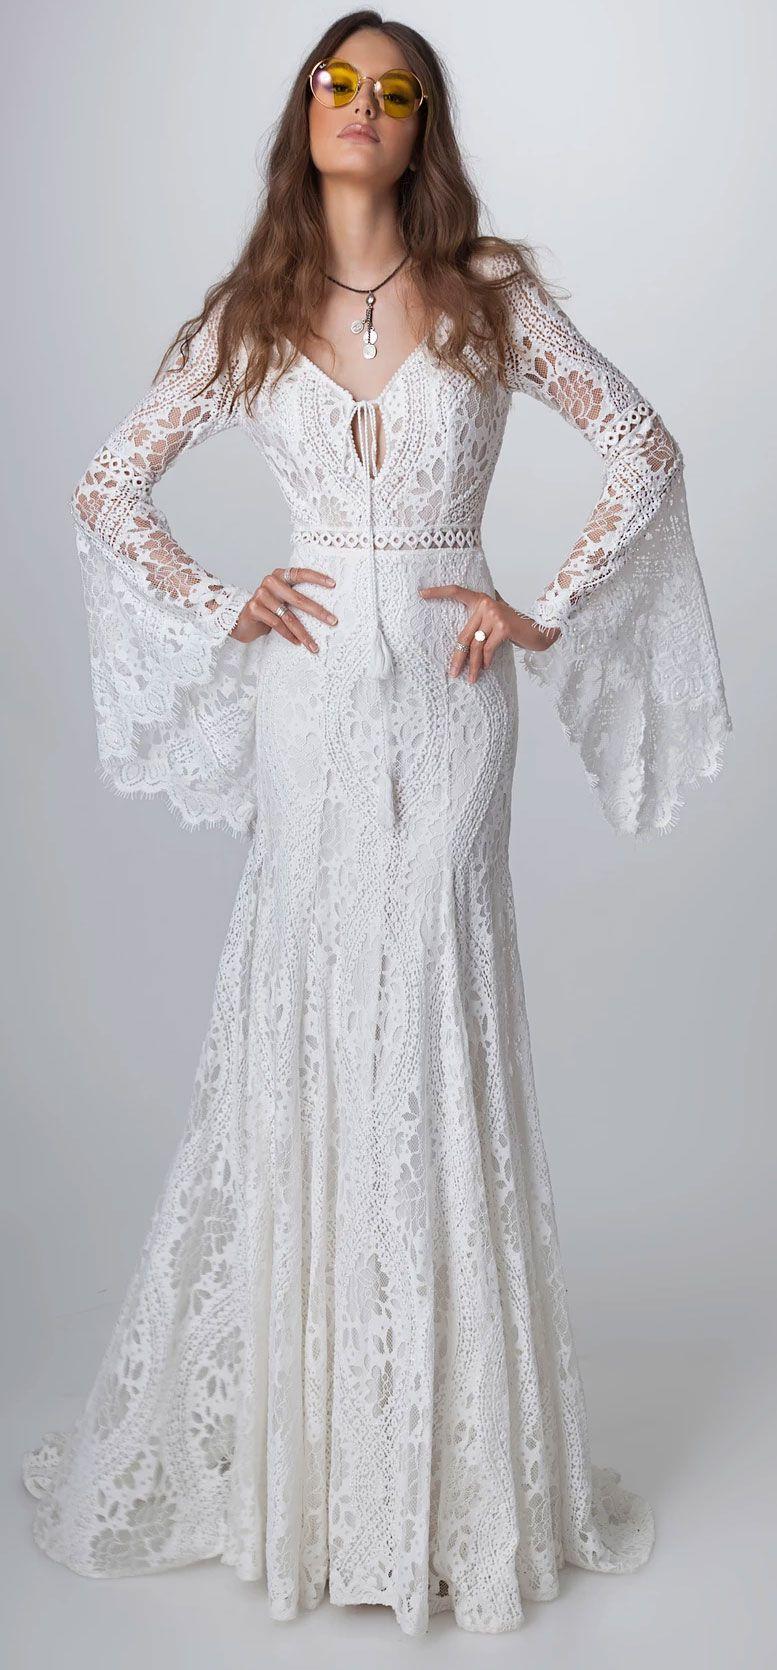 These Romantic Long sleeve boho Wedding Dresses are pure romance